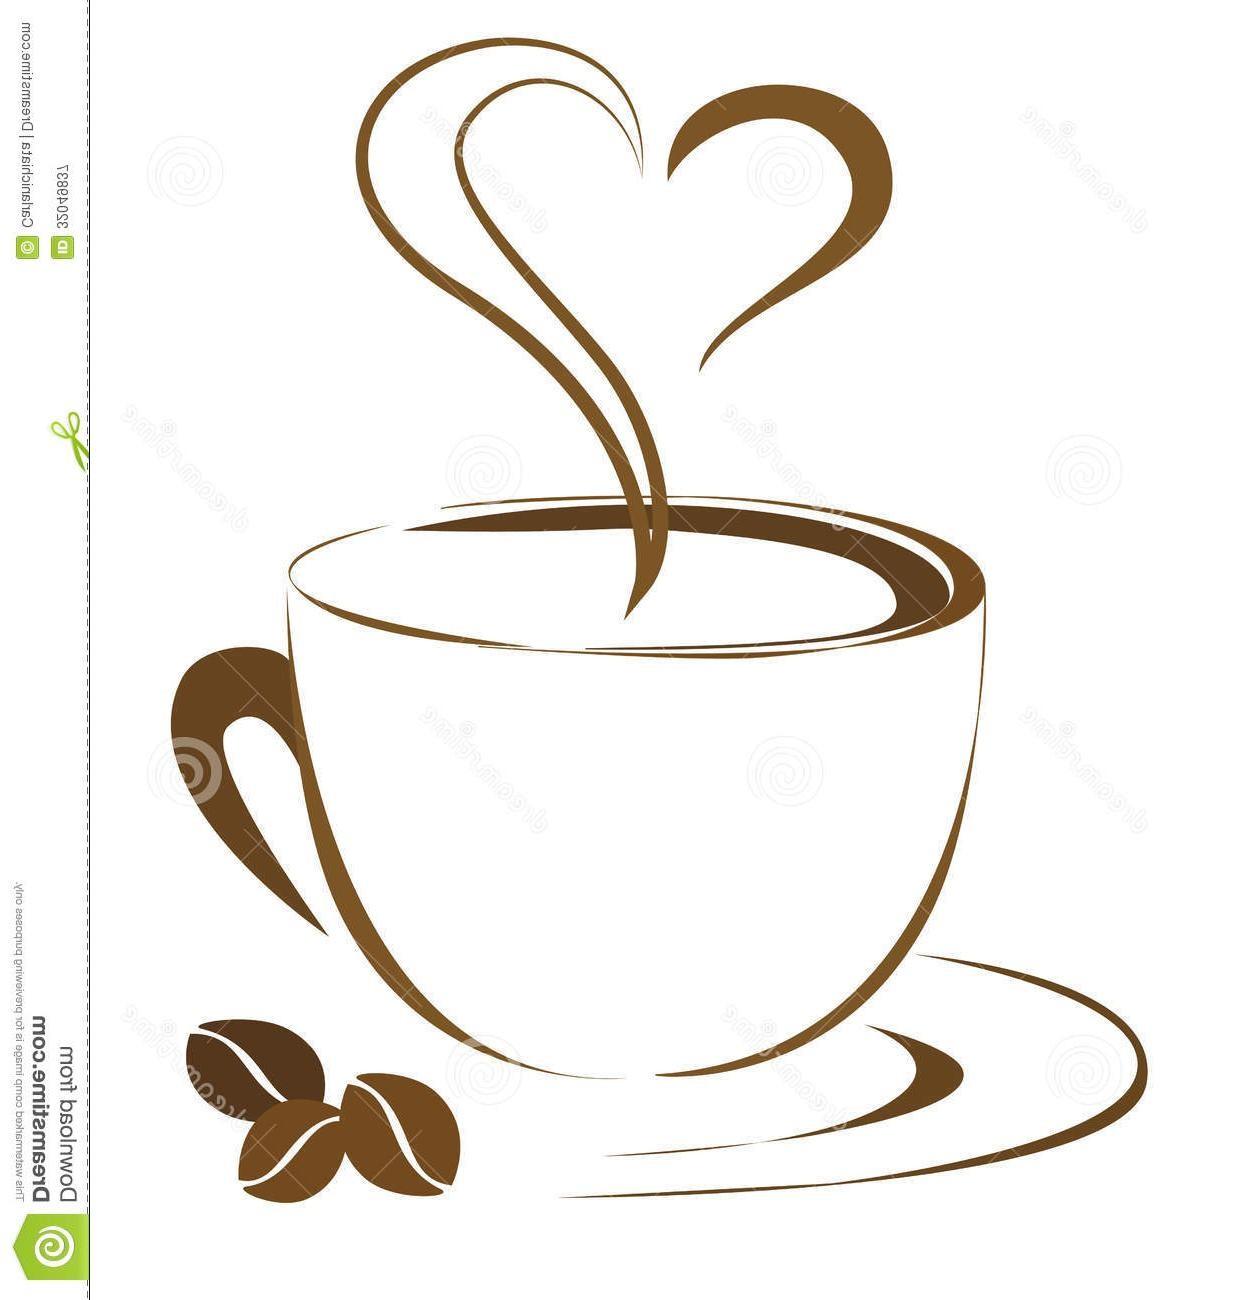 Coffee Mug Clipart at GetDrawings.com.